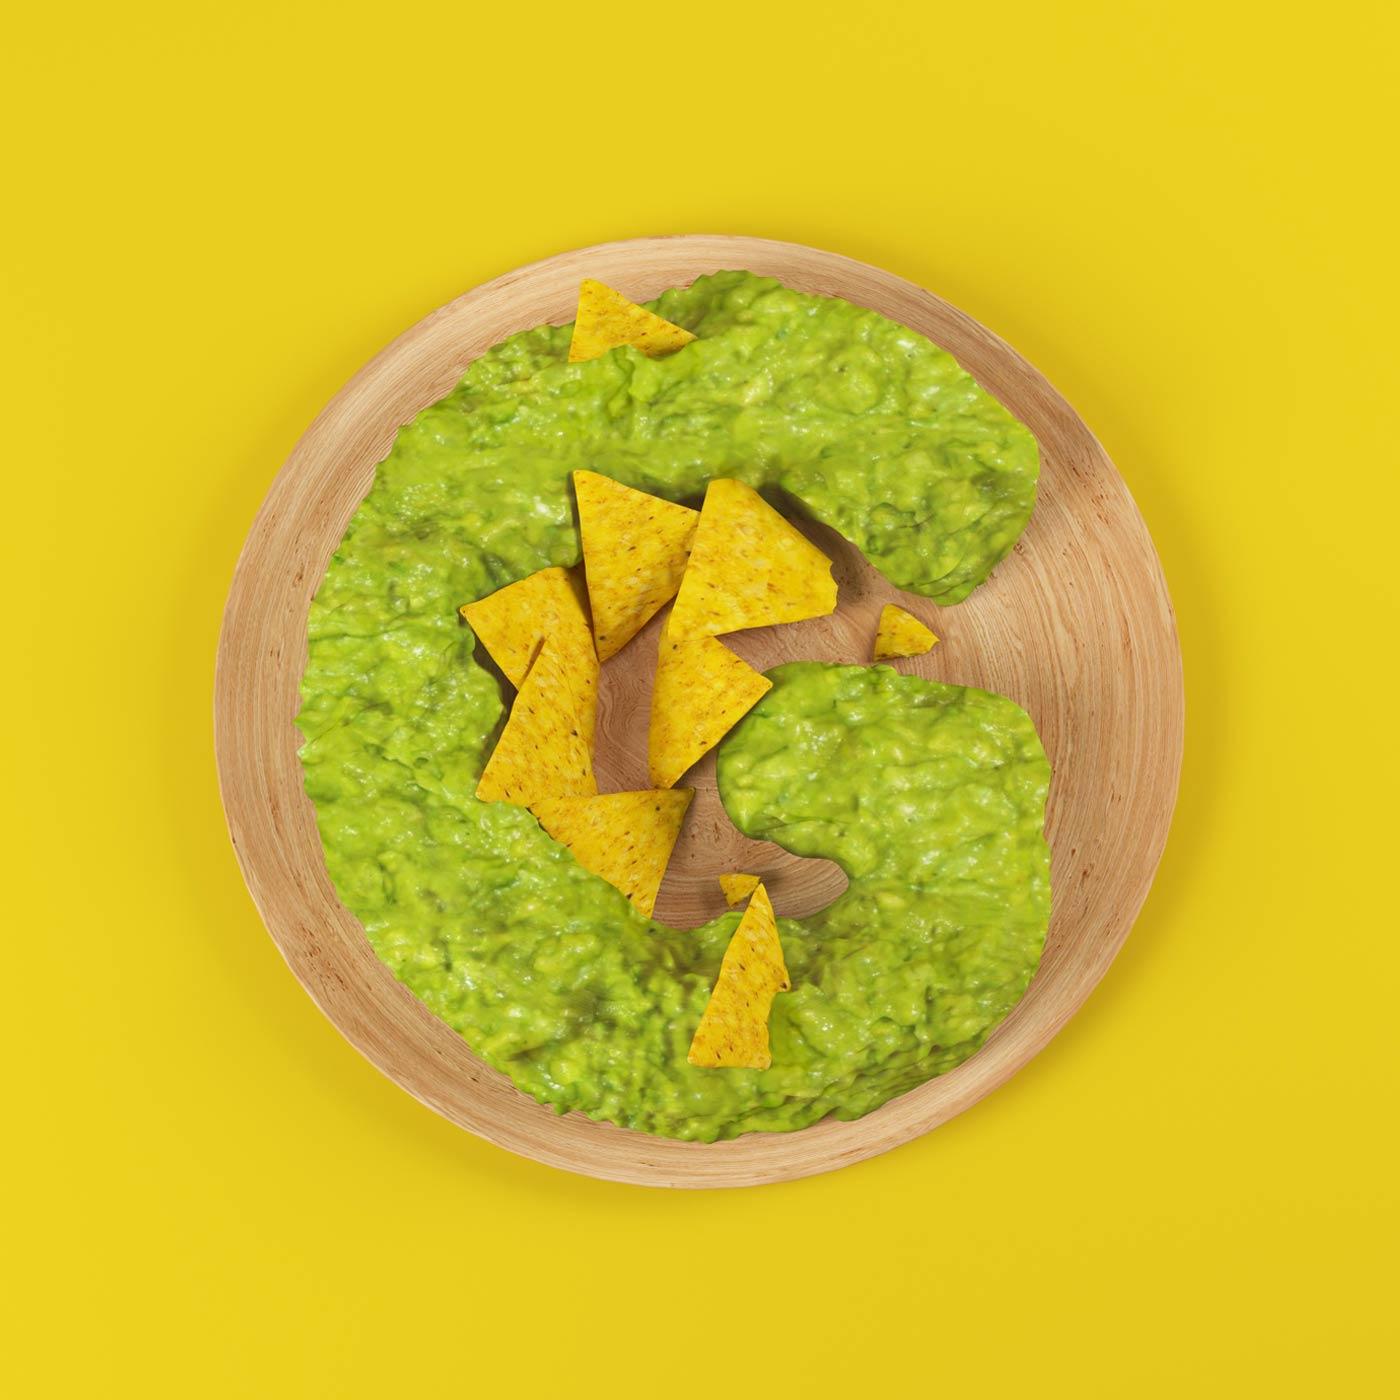 FOOD 3DFOOD FOODALPHABET CESS 3D 3DTYPE LETTERING CGI 3DARTIST NACHOS